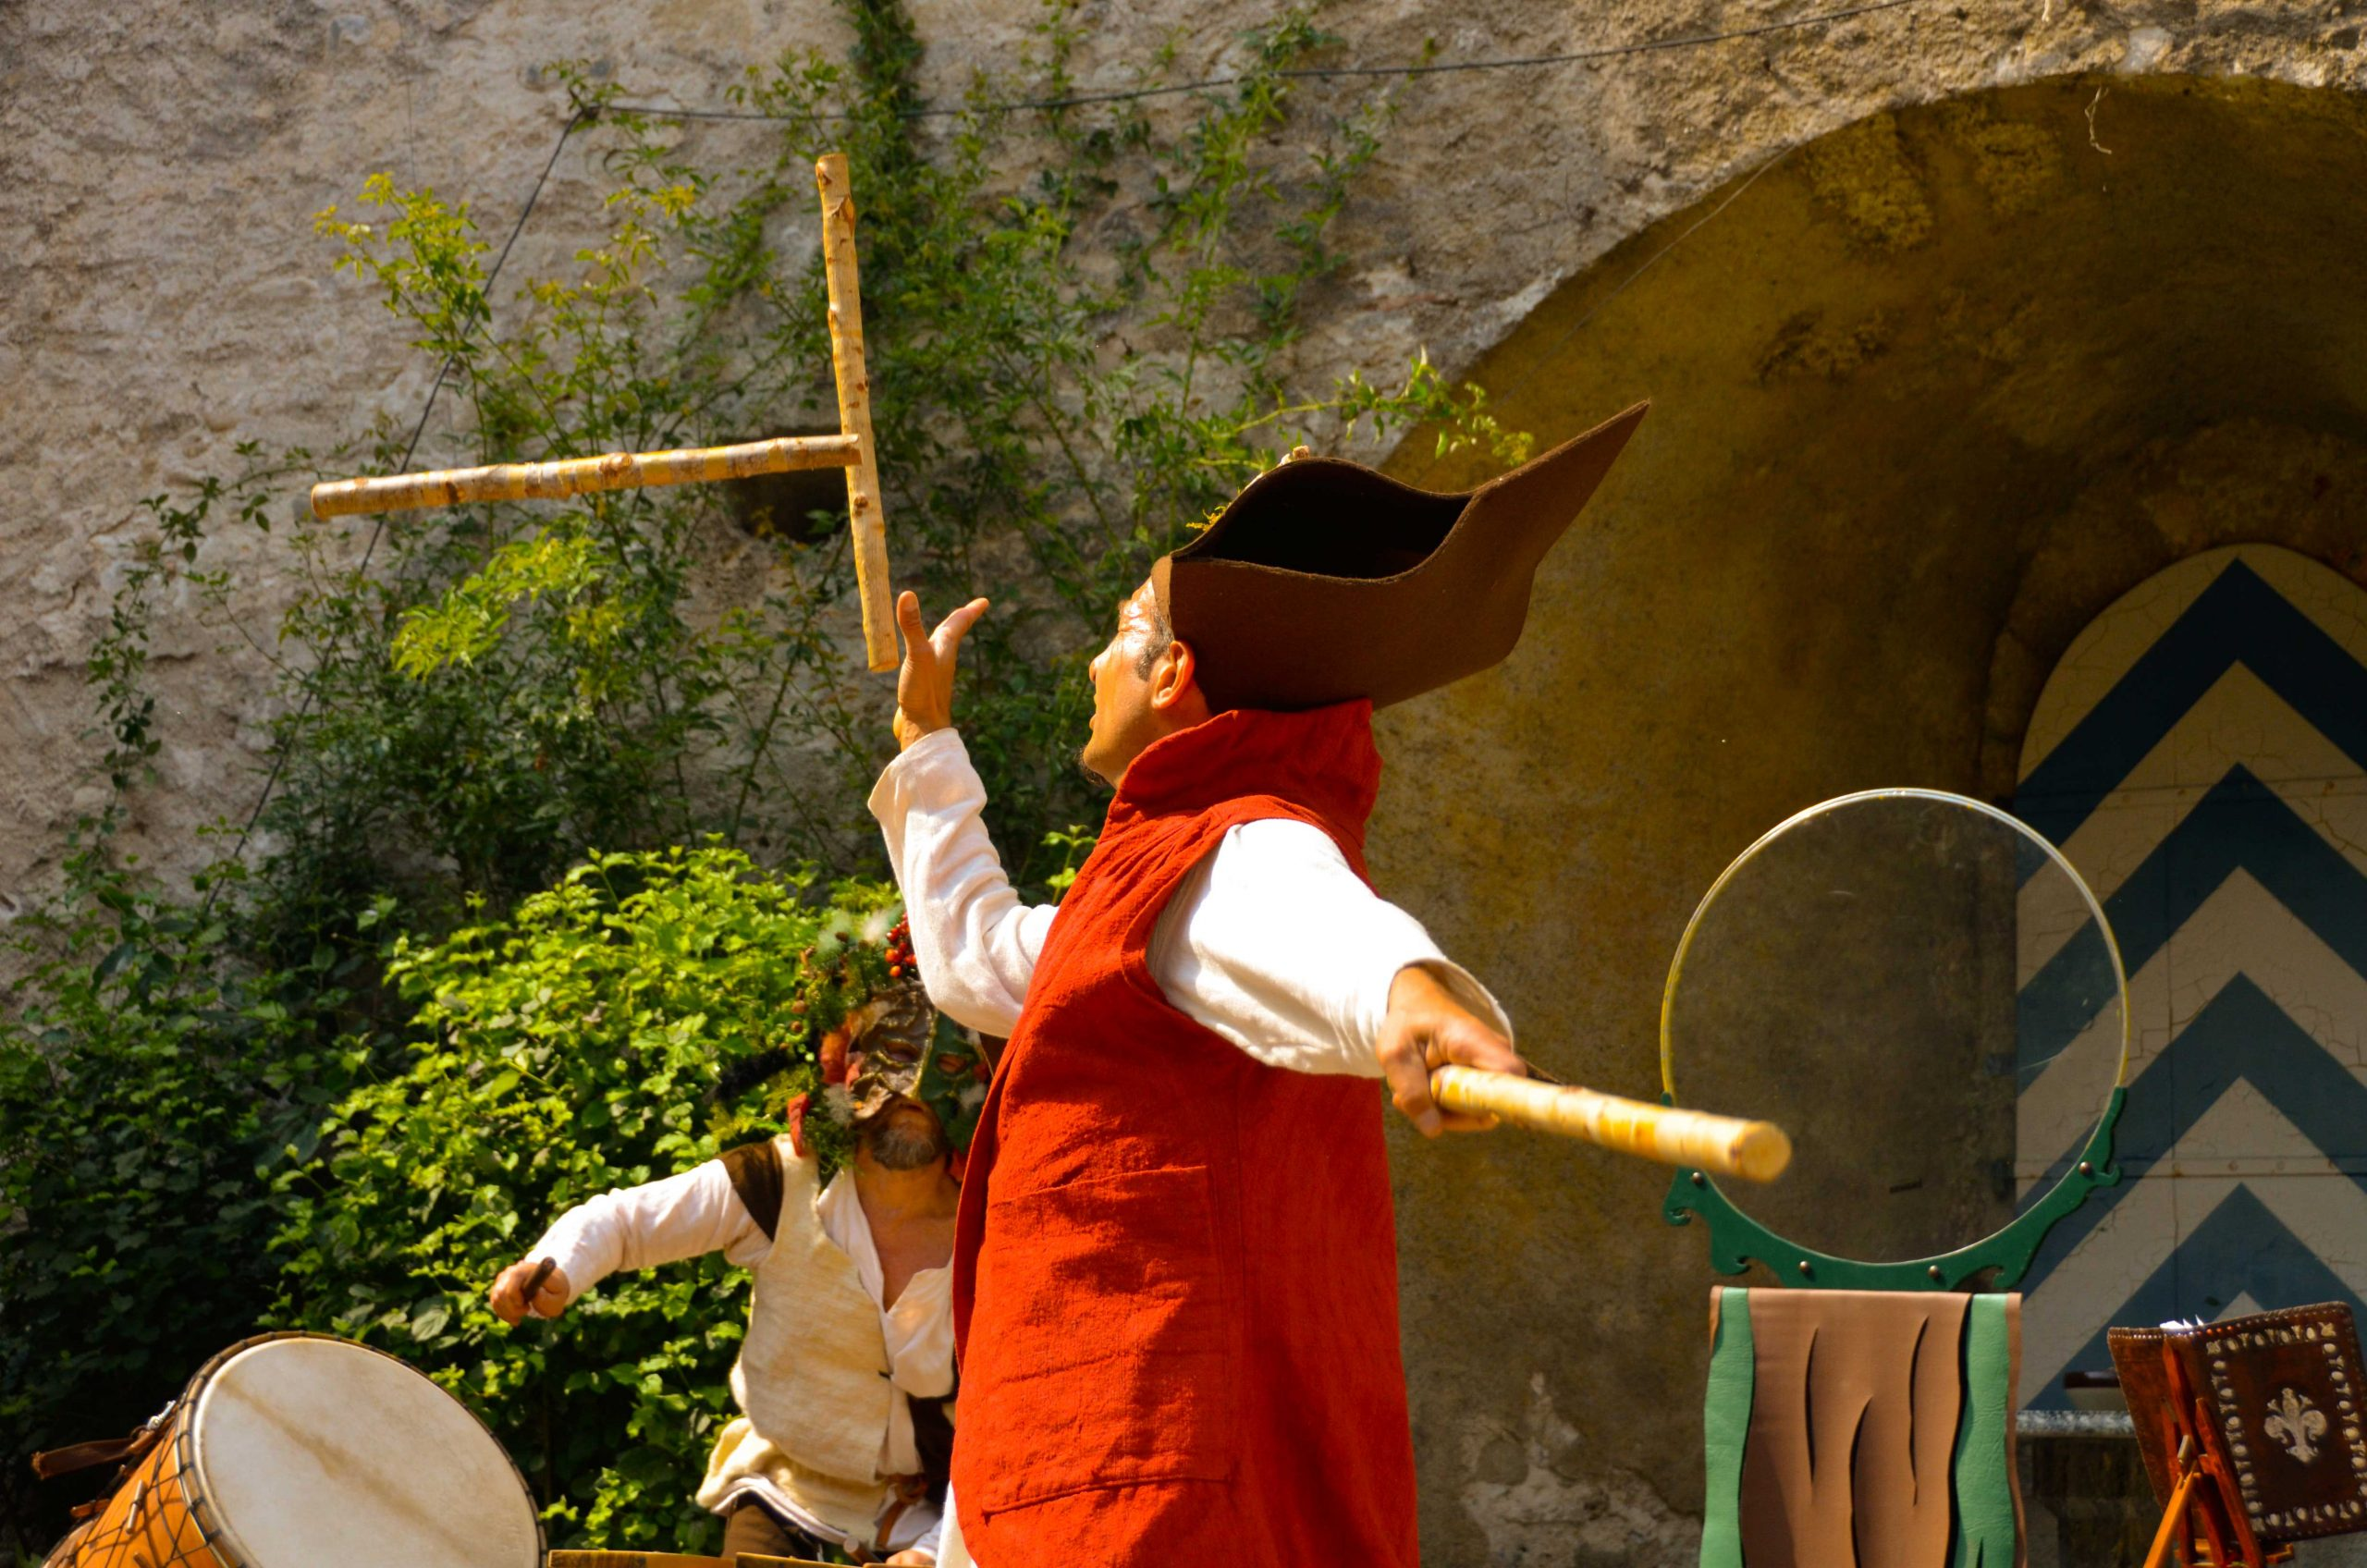 Albertius, jongleur médiéval